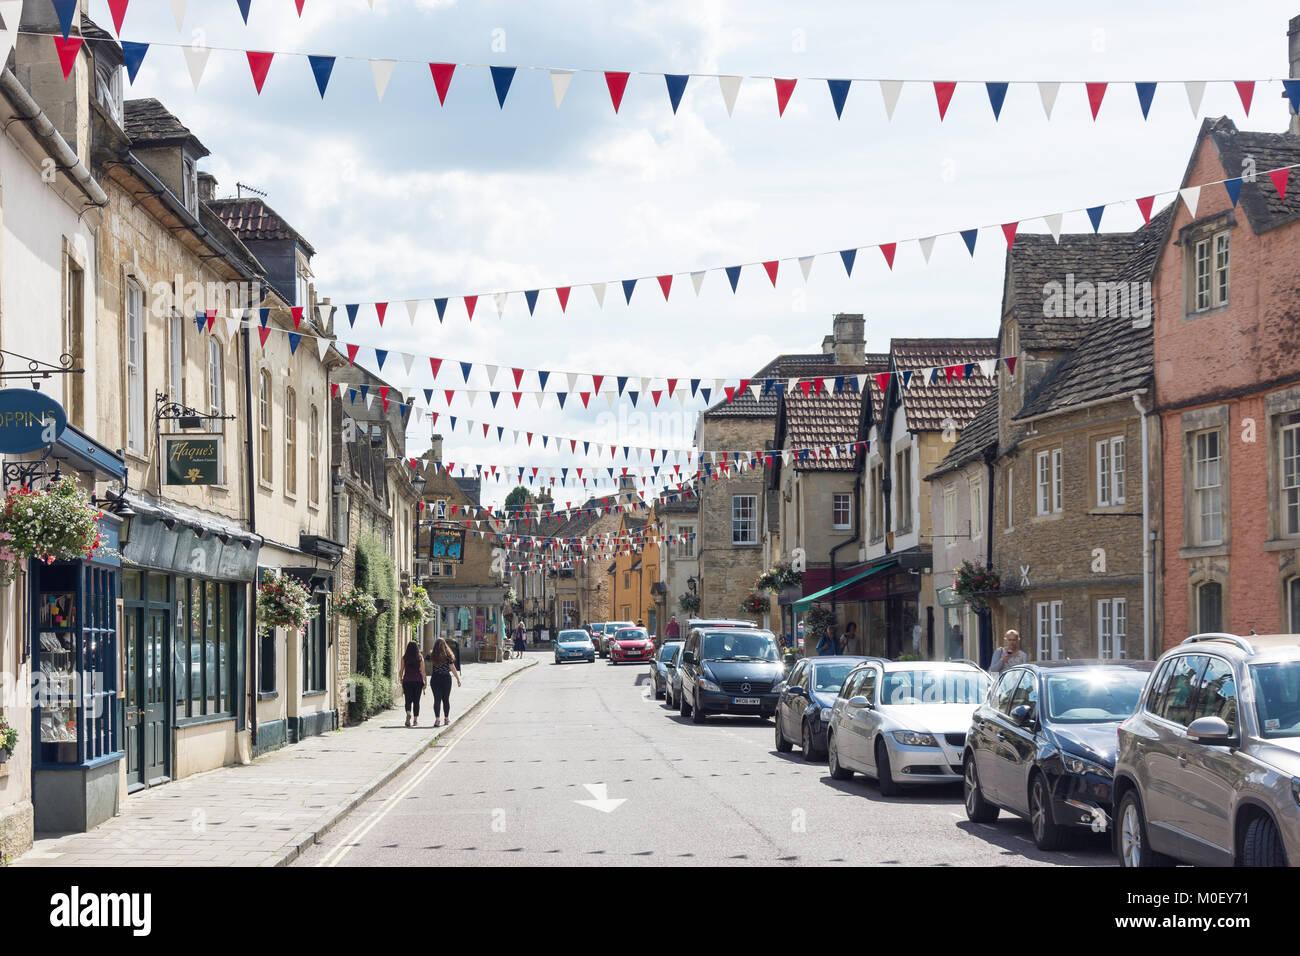 High Street, Corsham, Wiltshire, England, United Kingdom Stock Photo